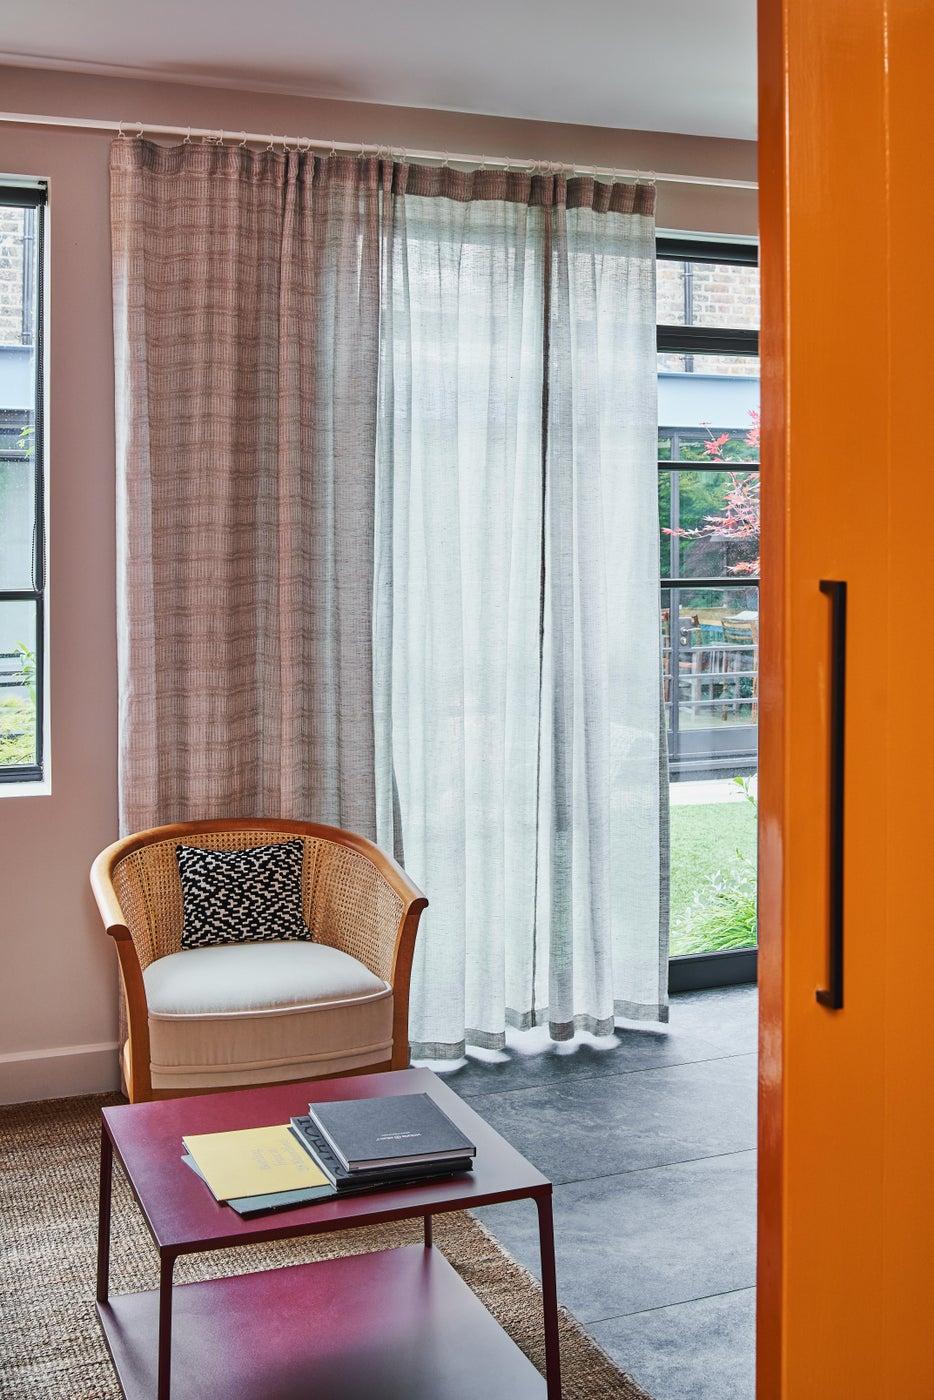 West London Design Studio, bright orange reception room